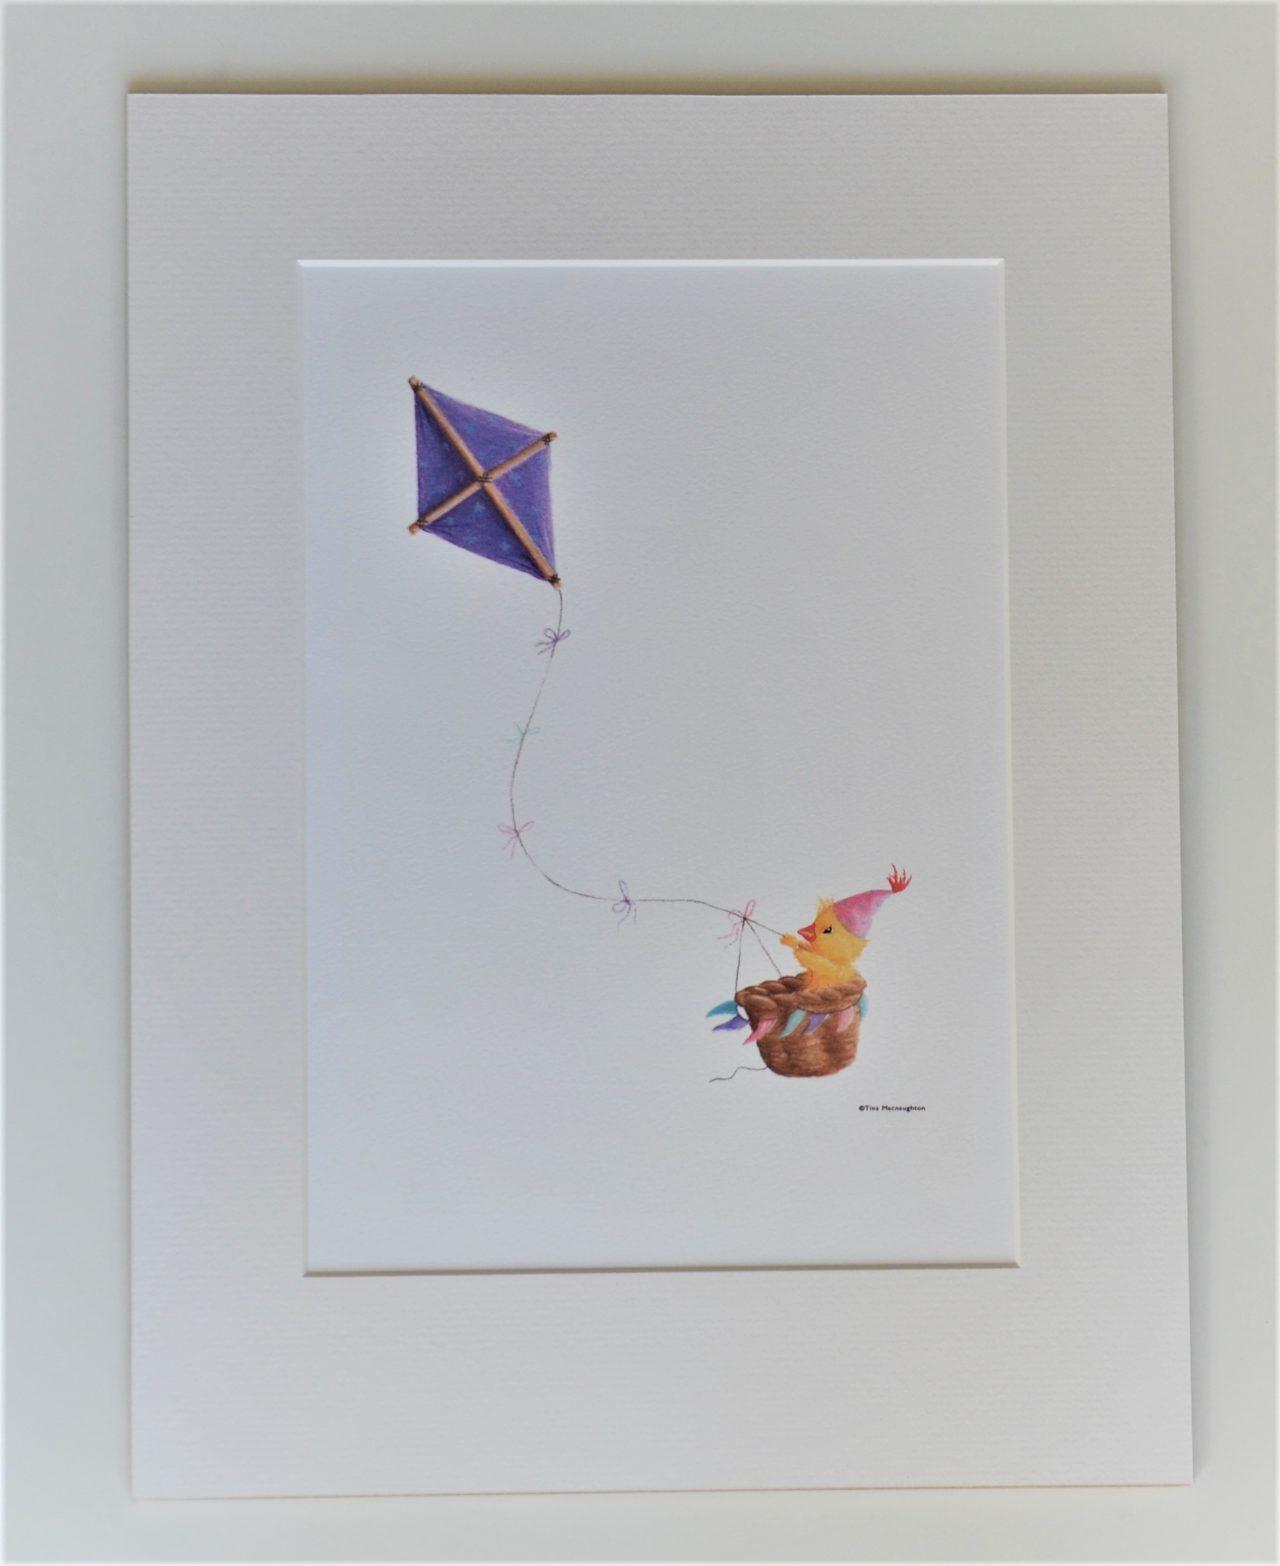 Duckling and Kite by Tina Macnaughton.